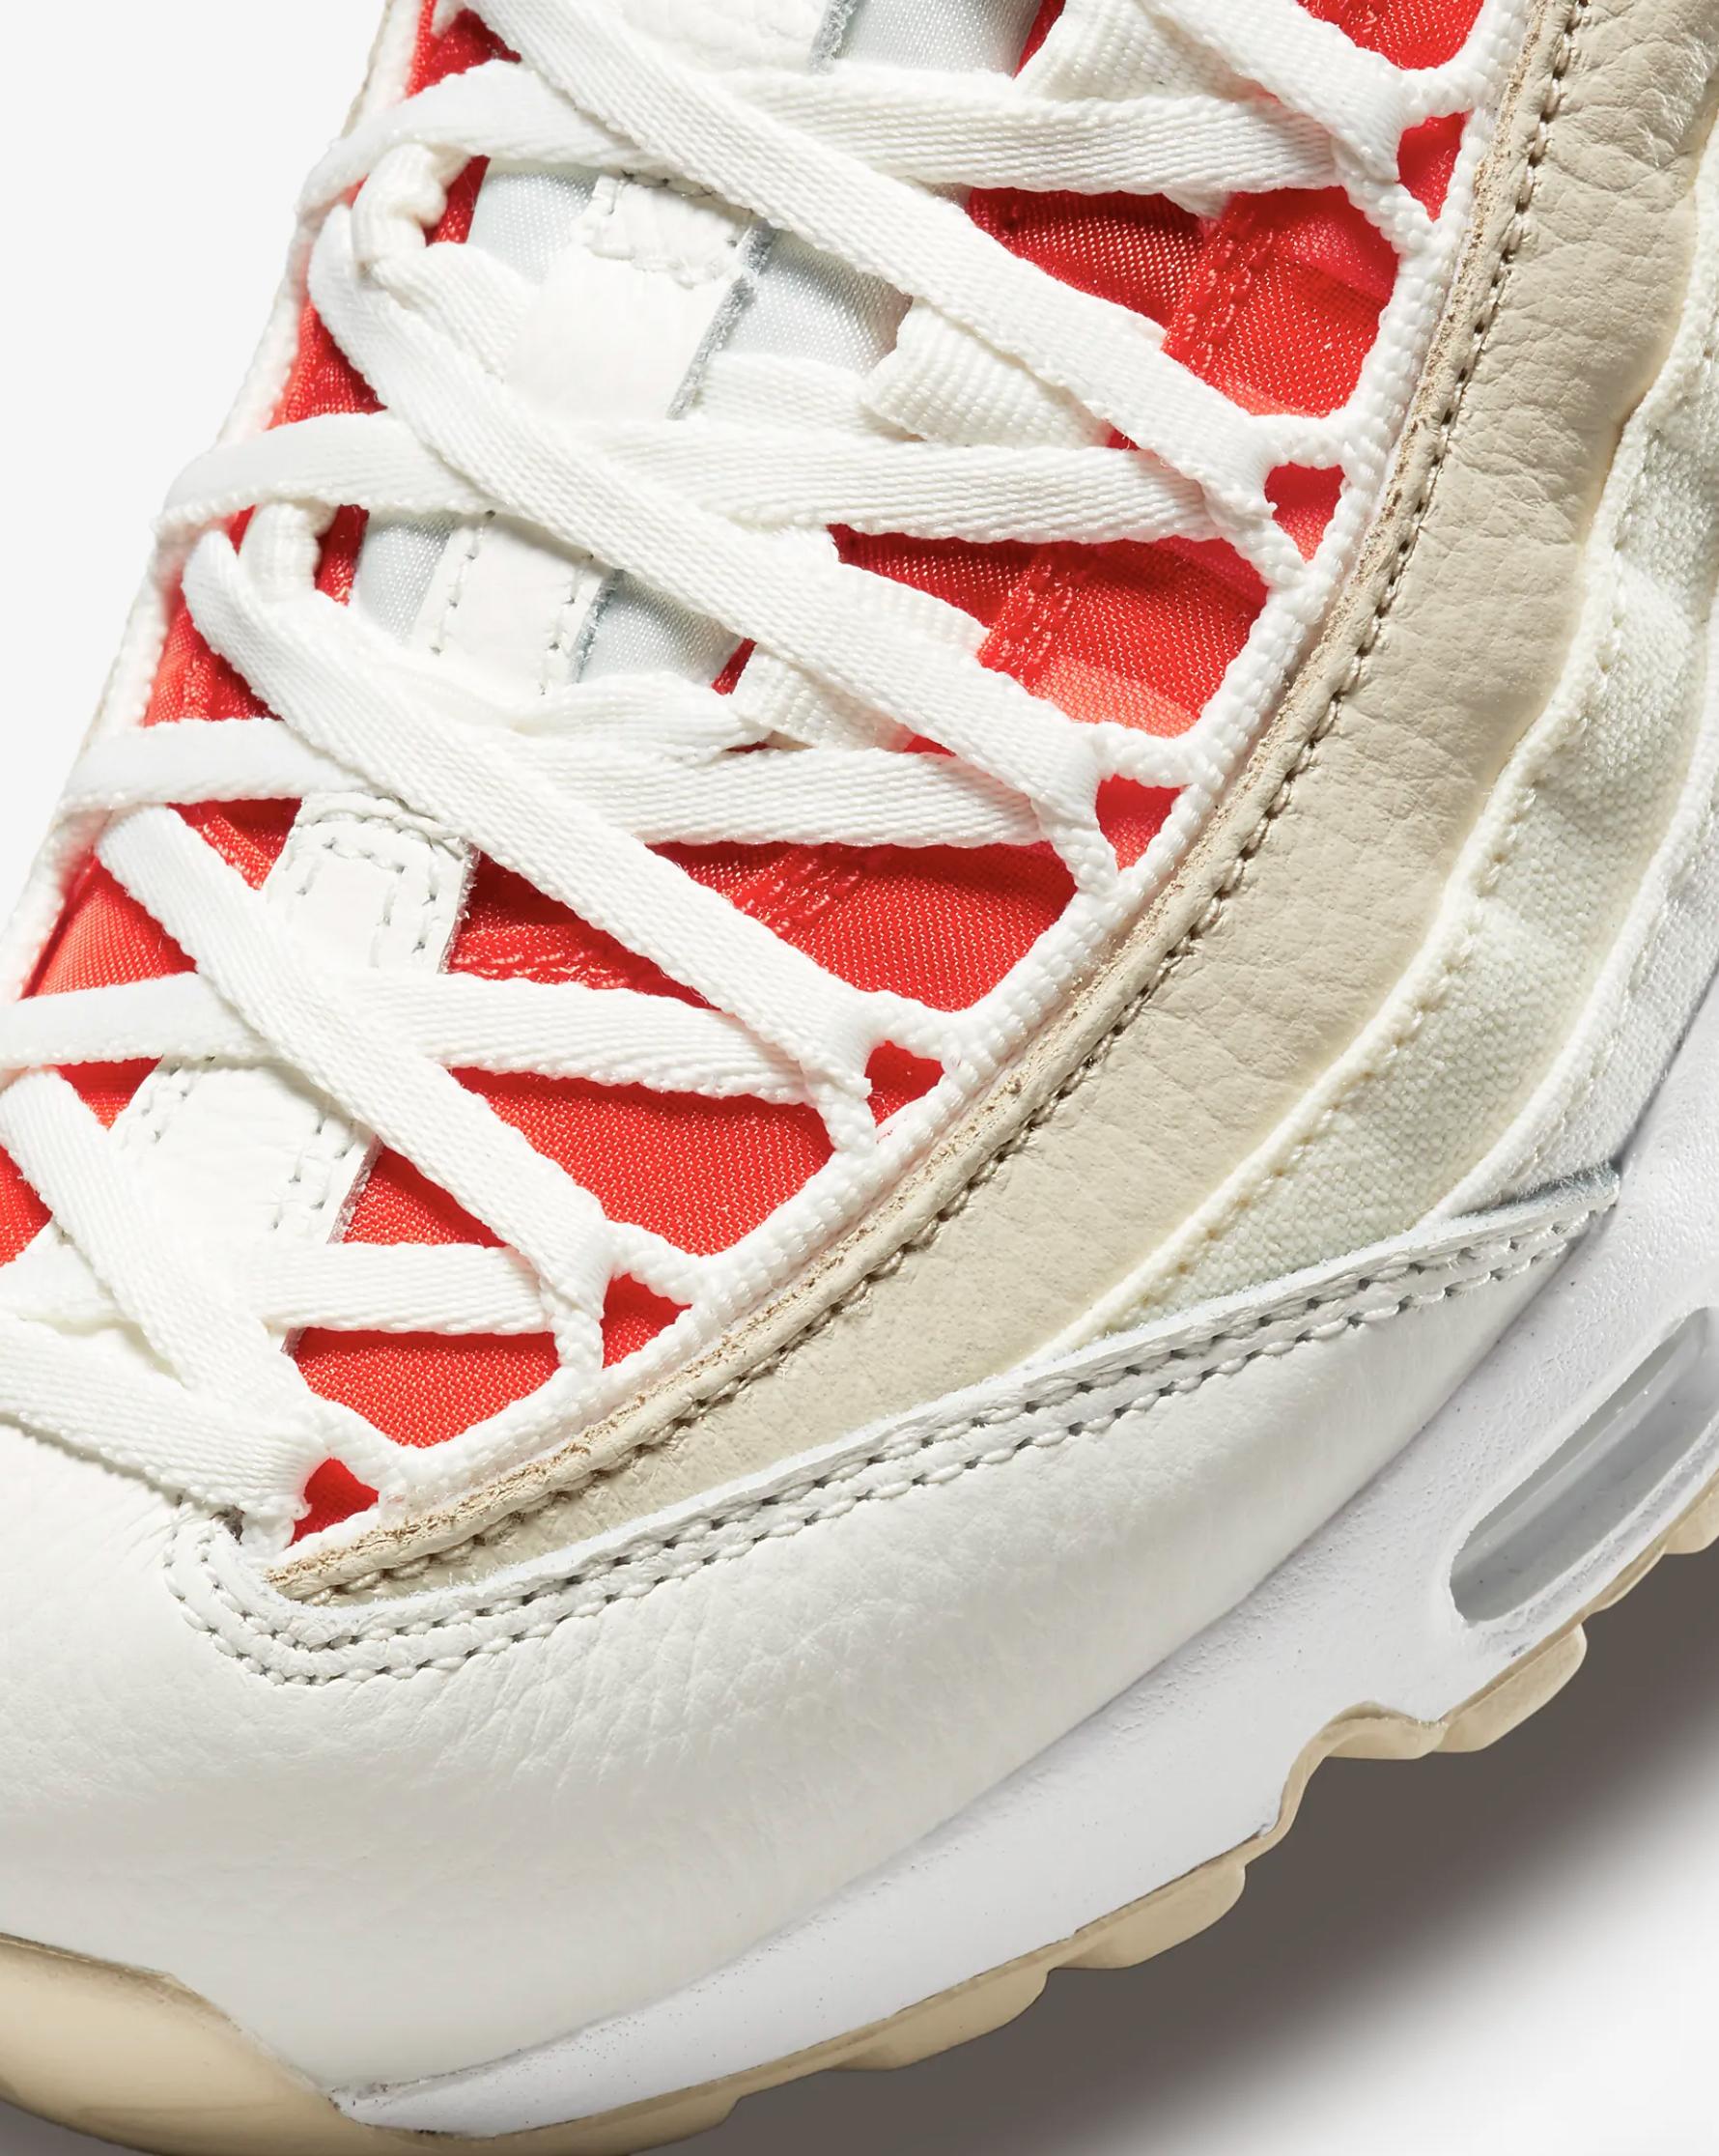 Nike WMNS Air Max 95 Coconut Milk 6